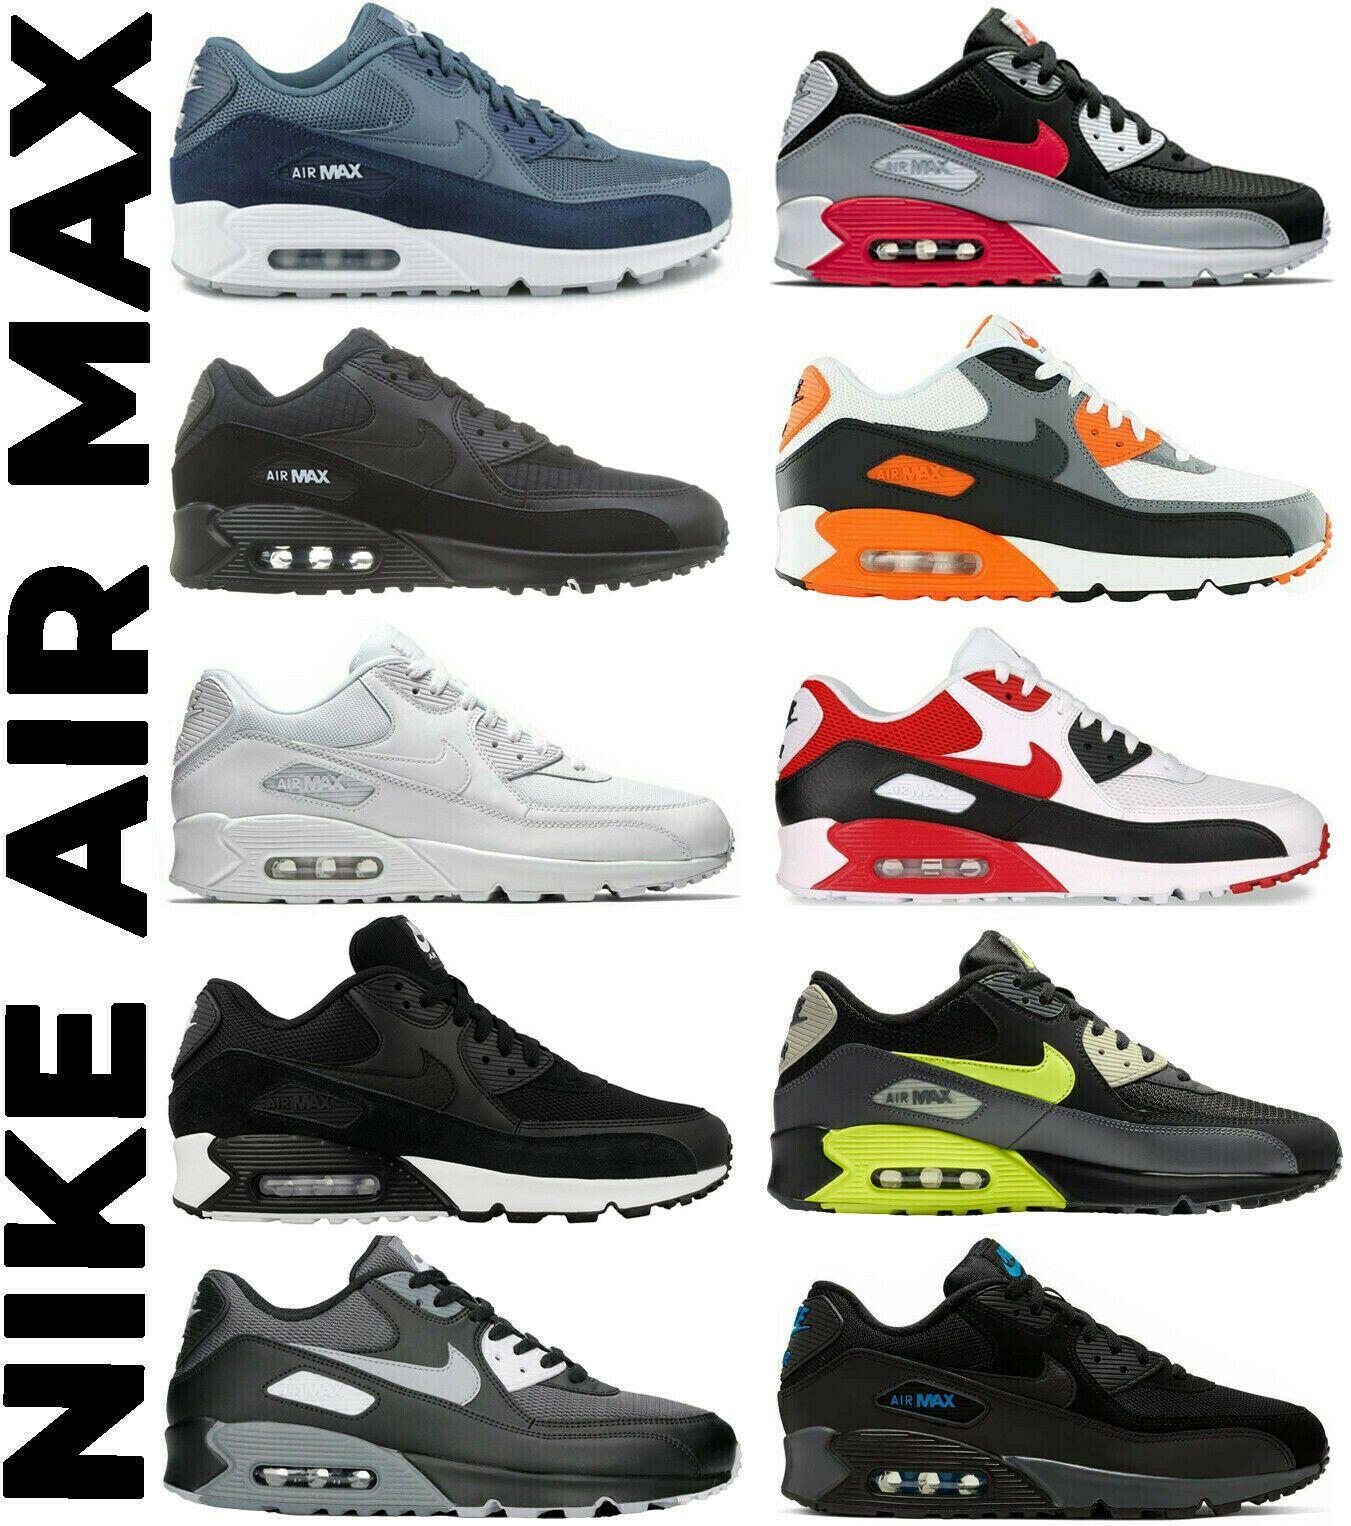 Nike Air Max 90 Essential Trainers Mens Womens Mens Shoes Sneakers Aj 1285 Ebay In 2020 Nike Air Max 90 Nike Air Max Nike Art